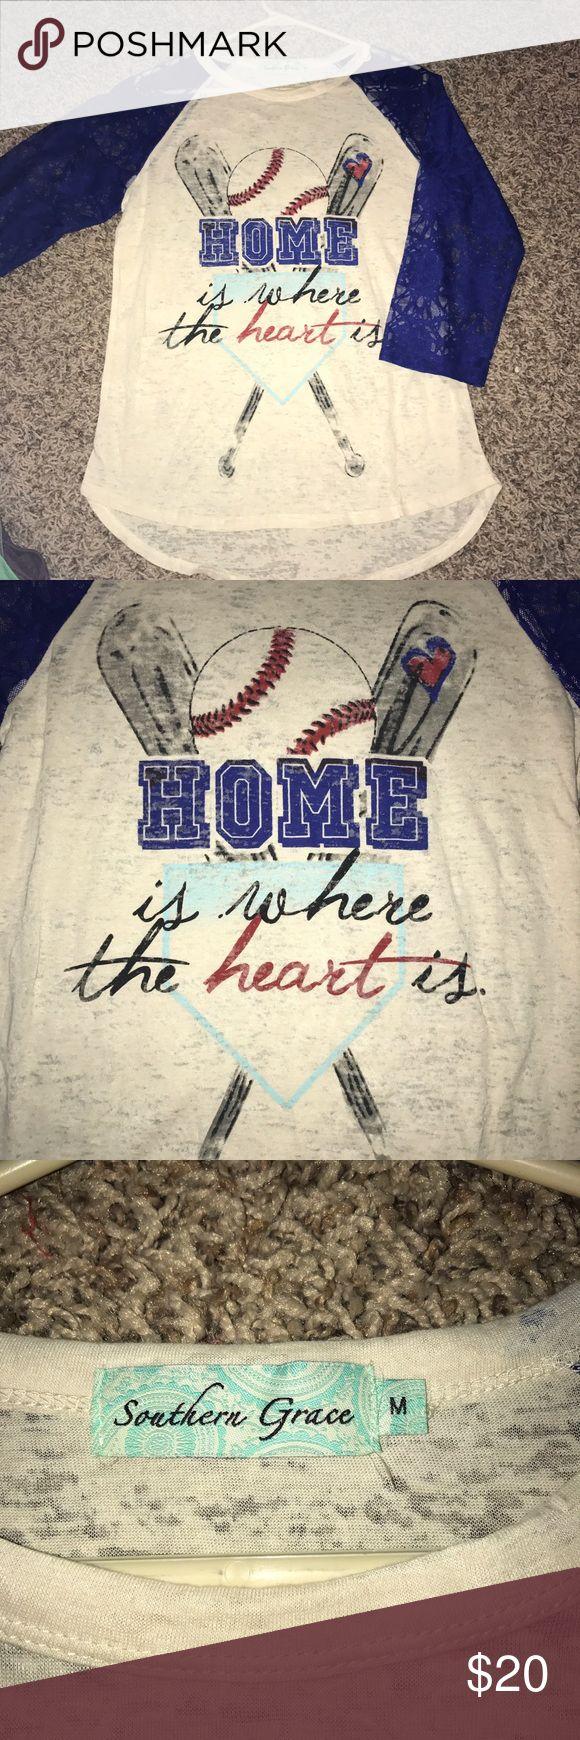 NWOT baseball burnout 3/4 sleeve shirt. Size M NWOT baseball burnout 3/4 sleeve shirt. Size M. Southern Grace brand. Smoke free home. Southern Grace Tops